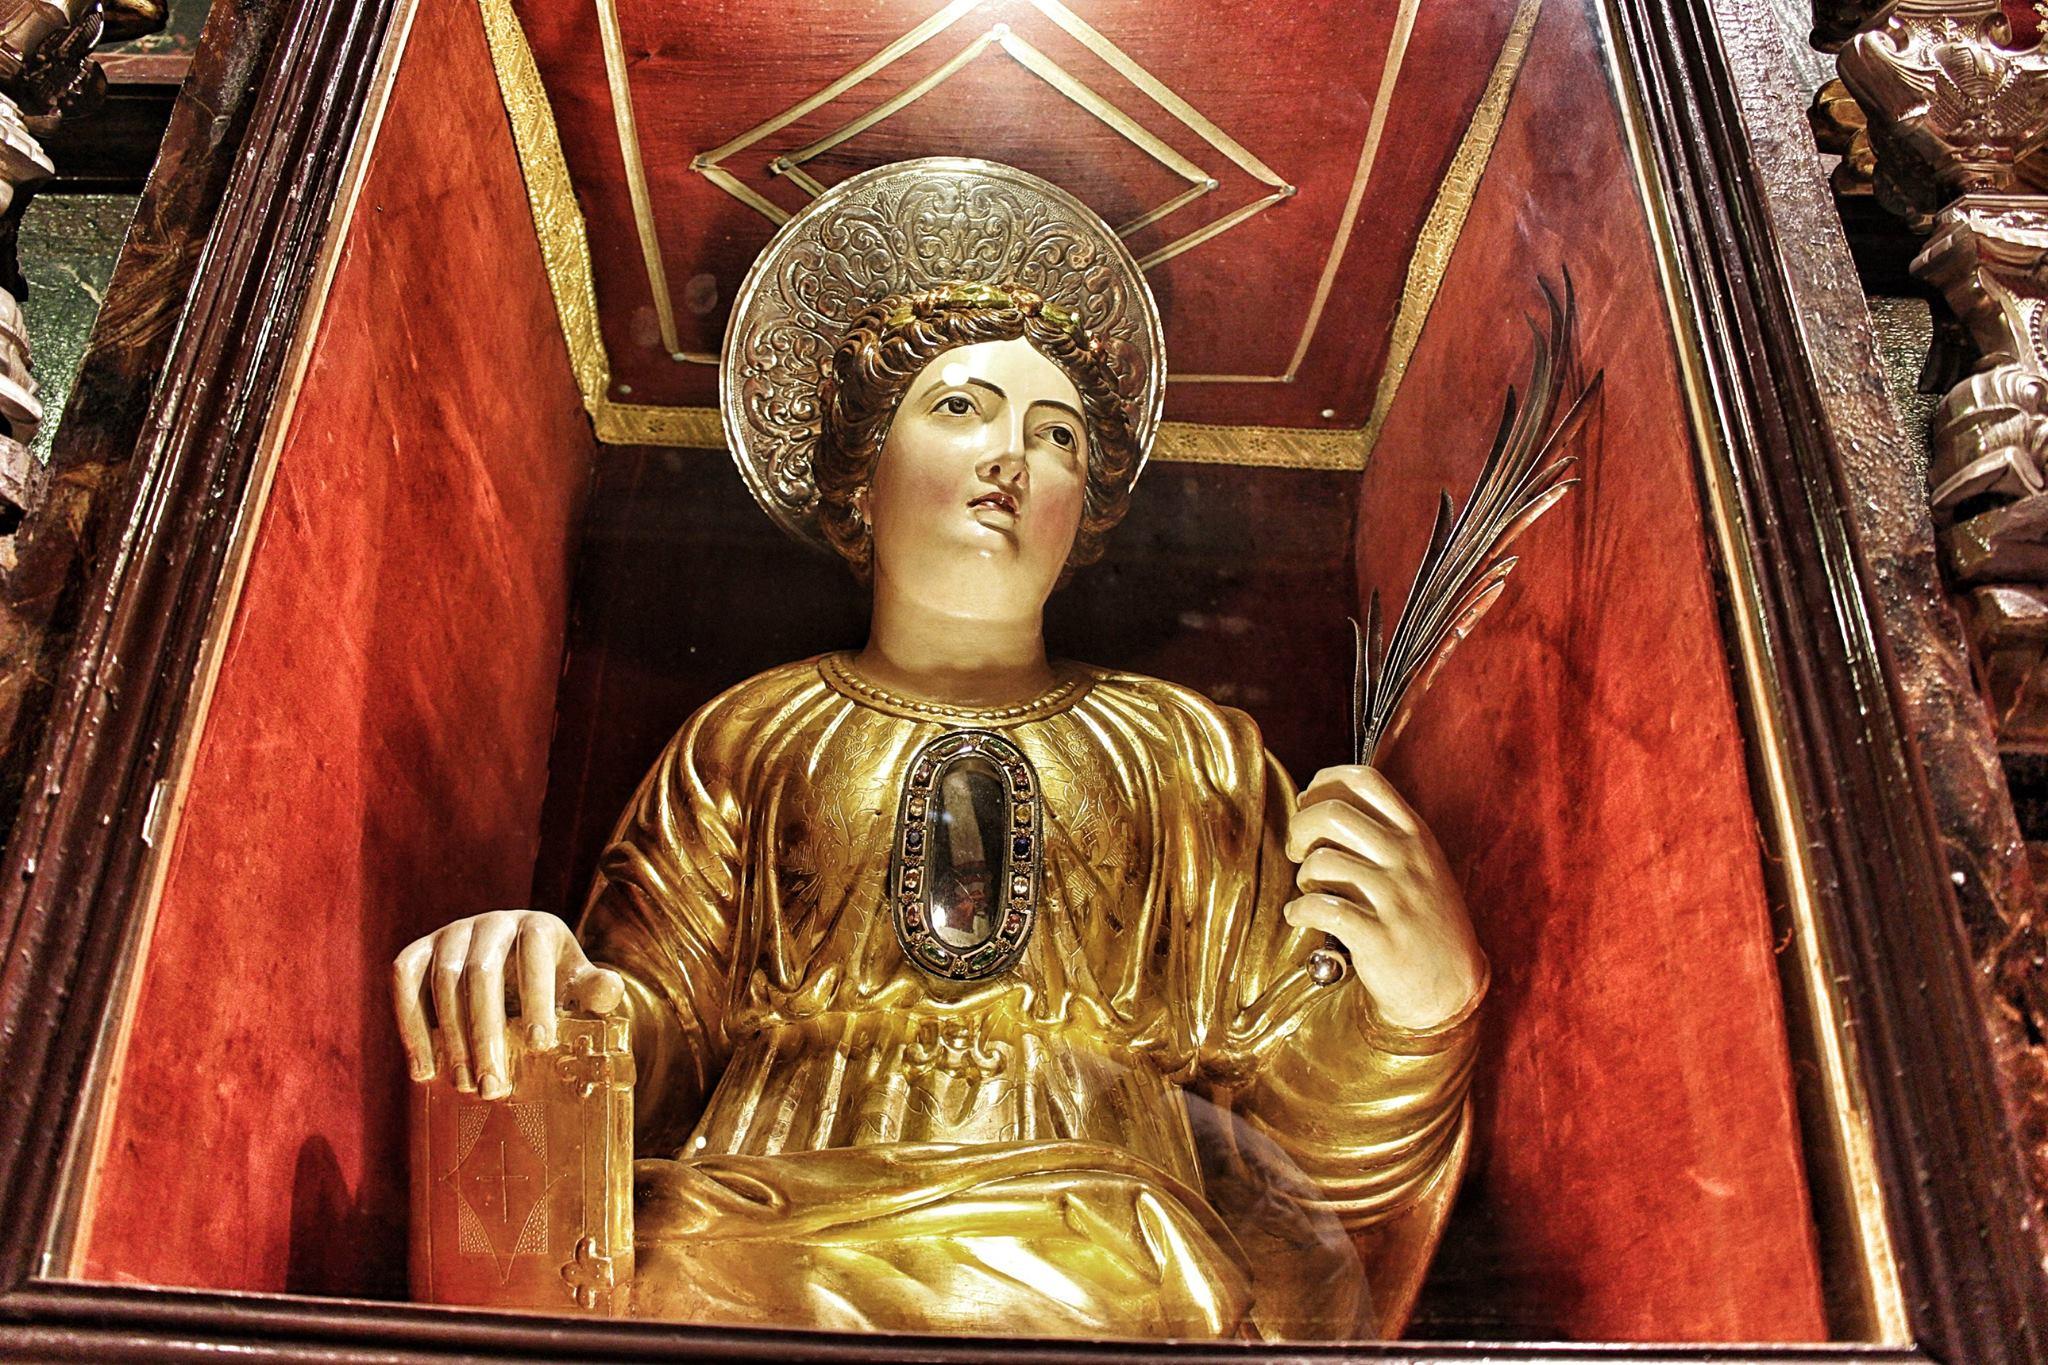 The effigy of Saint Ursula